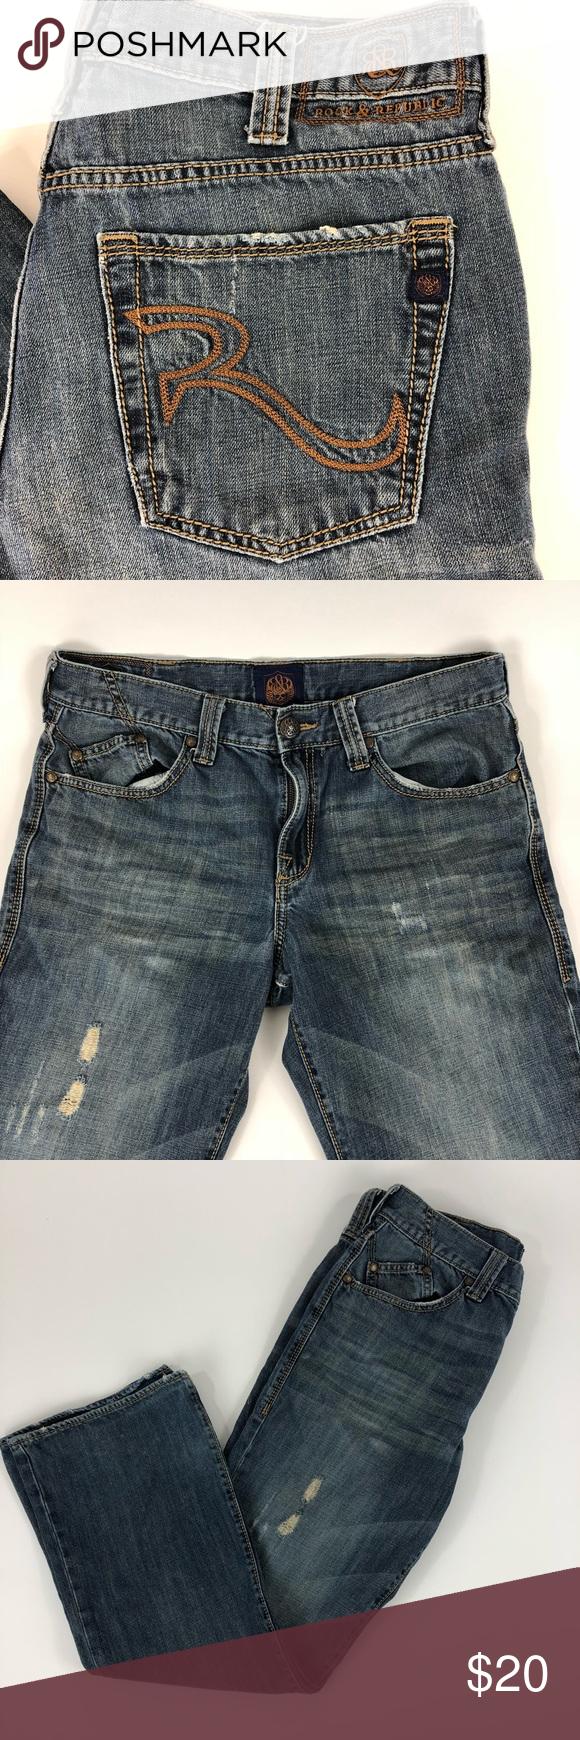 37++ Rock and republic jeans mens ideas ideas